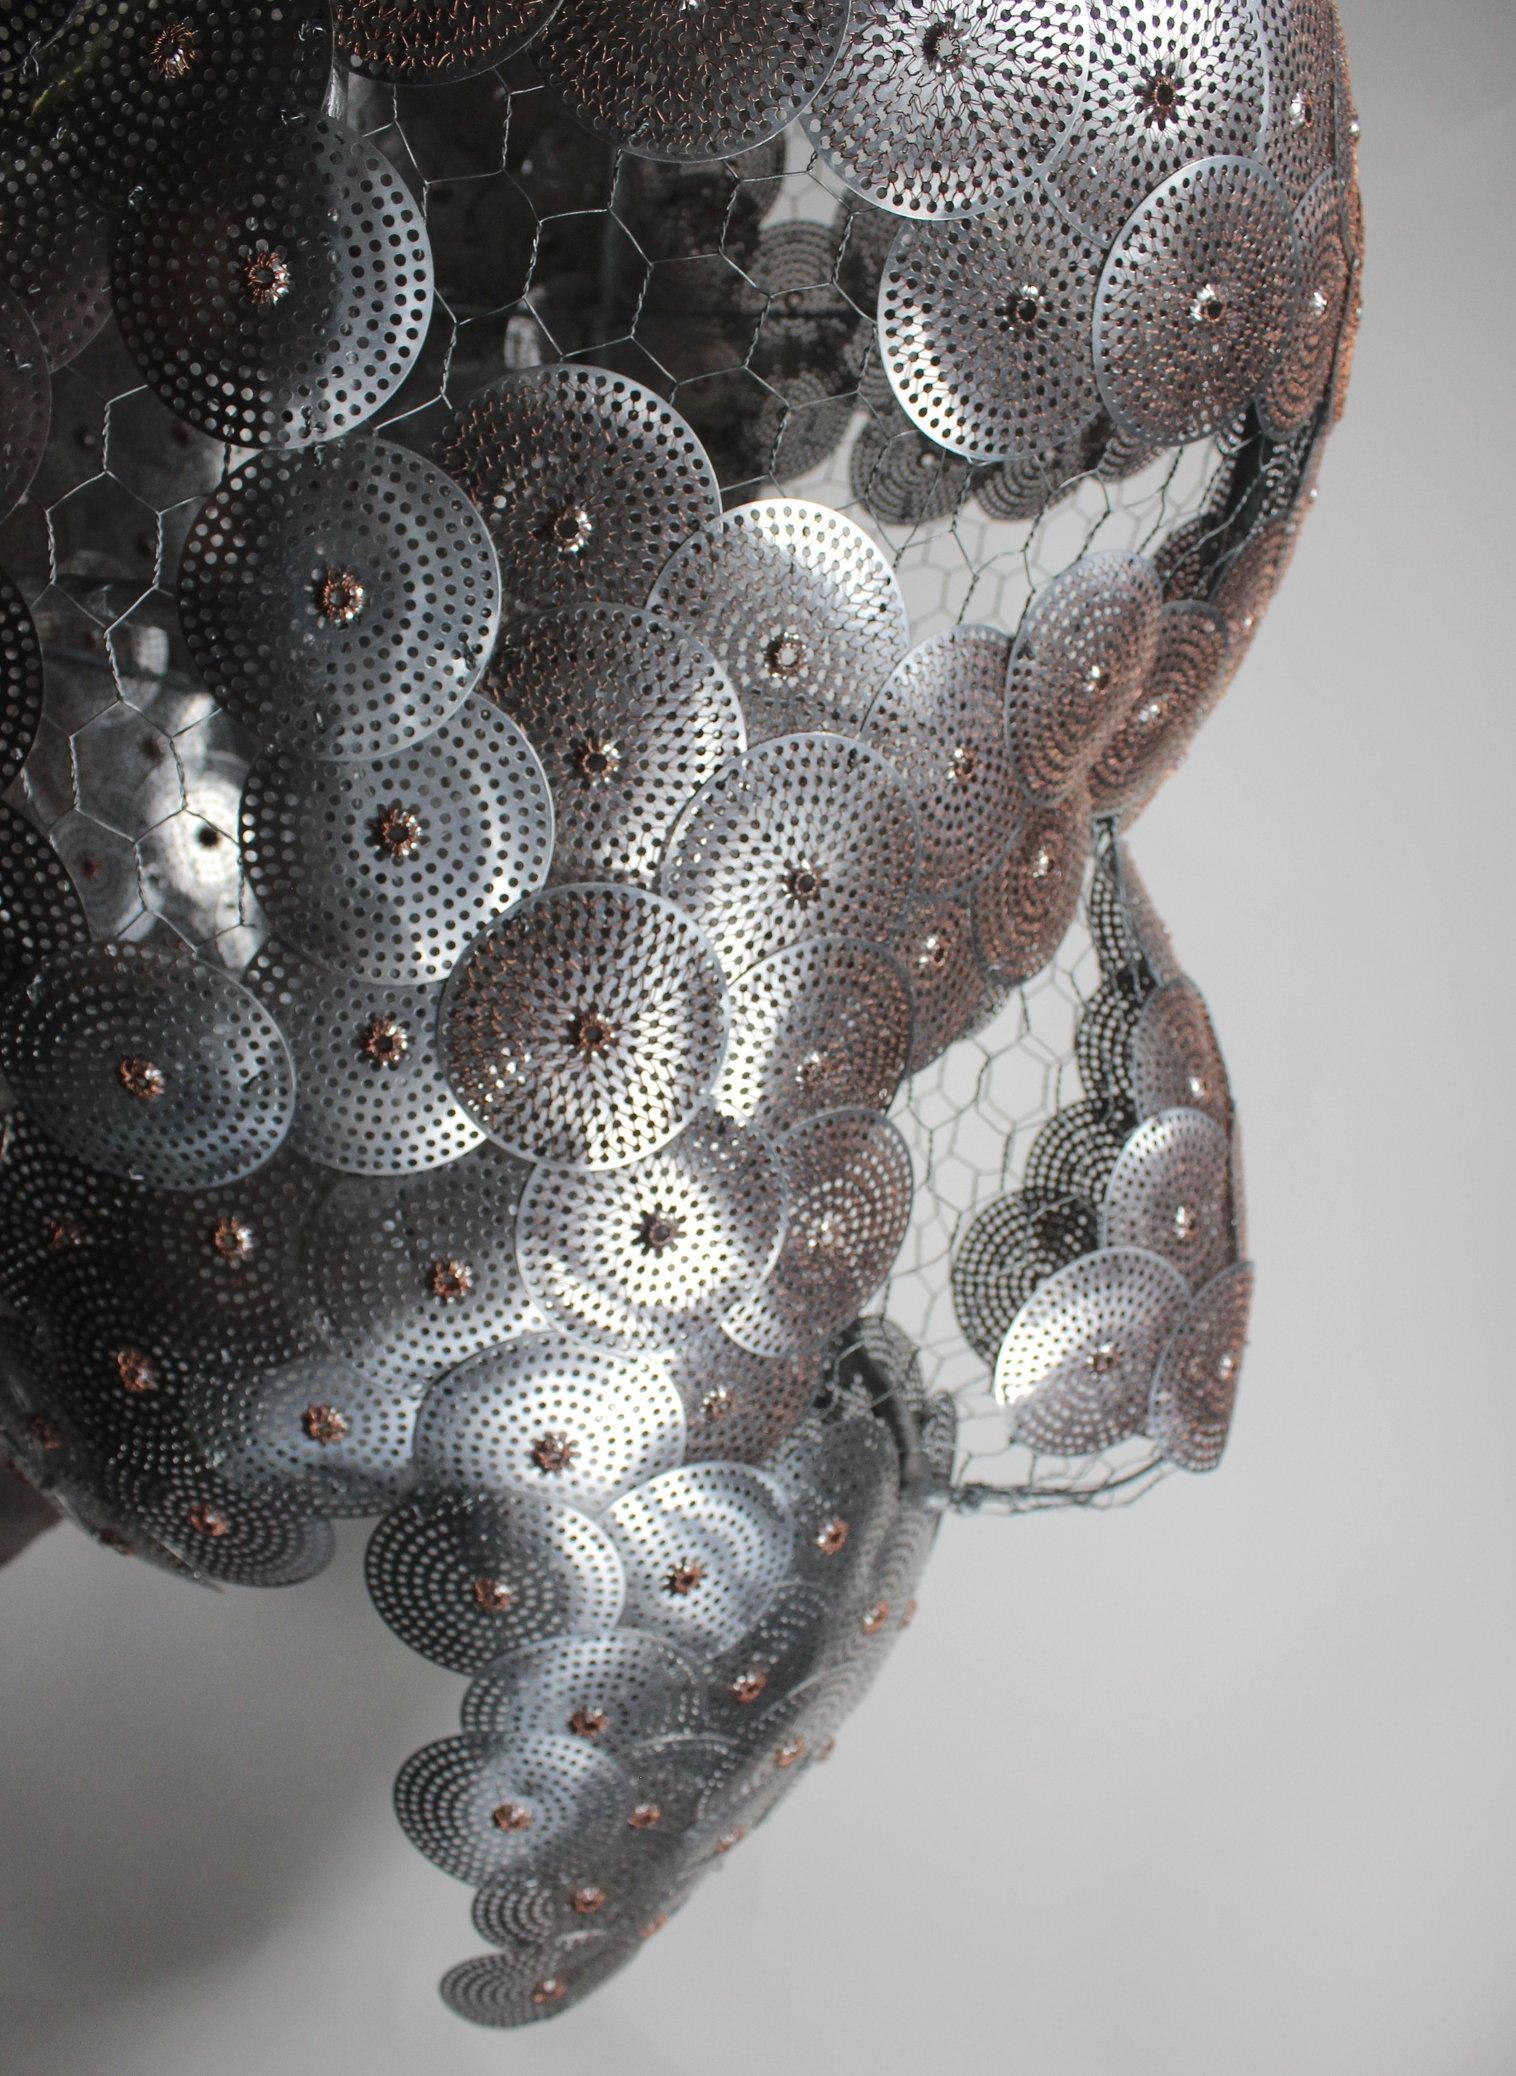 Double Life-Mask #2_detail2.JPG